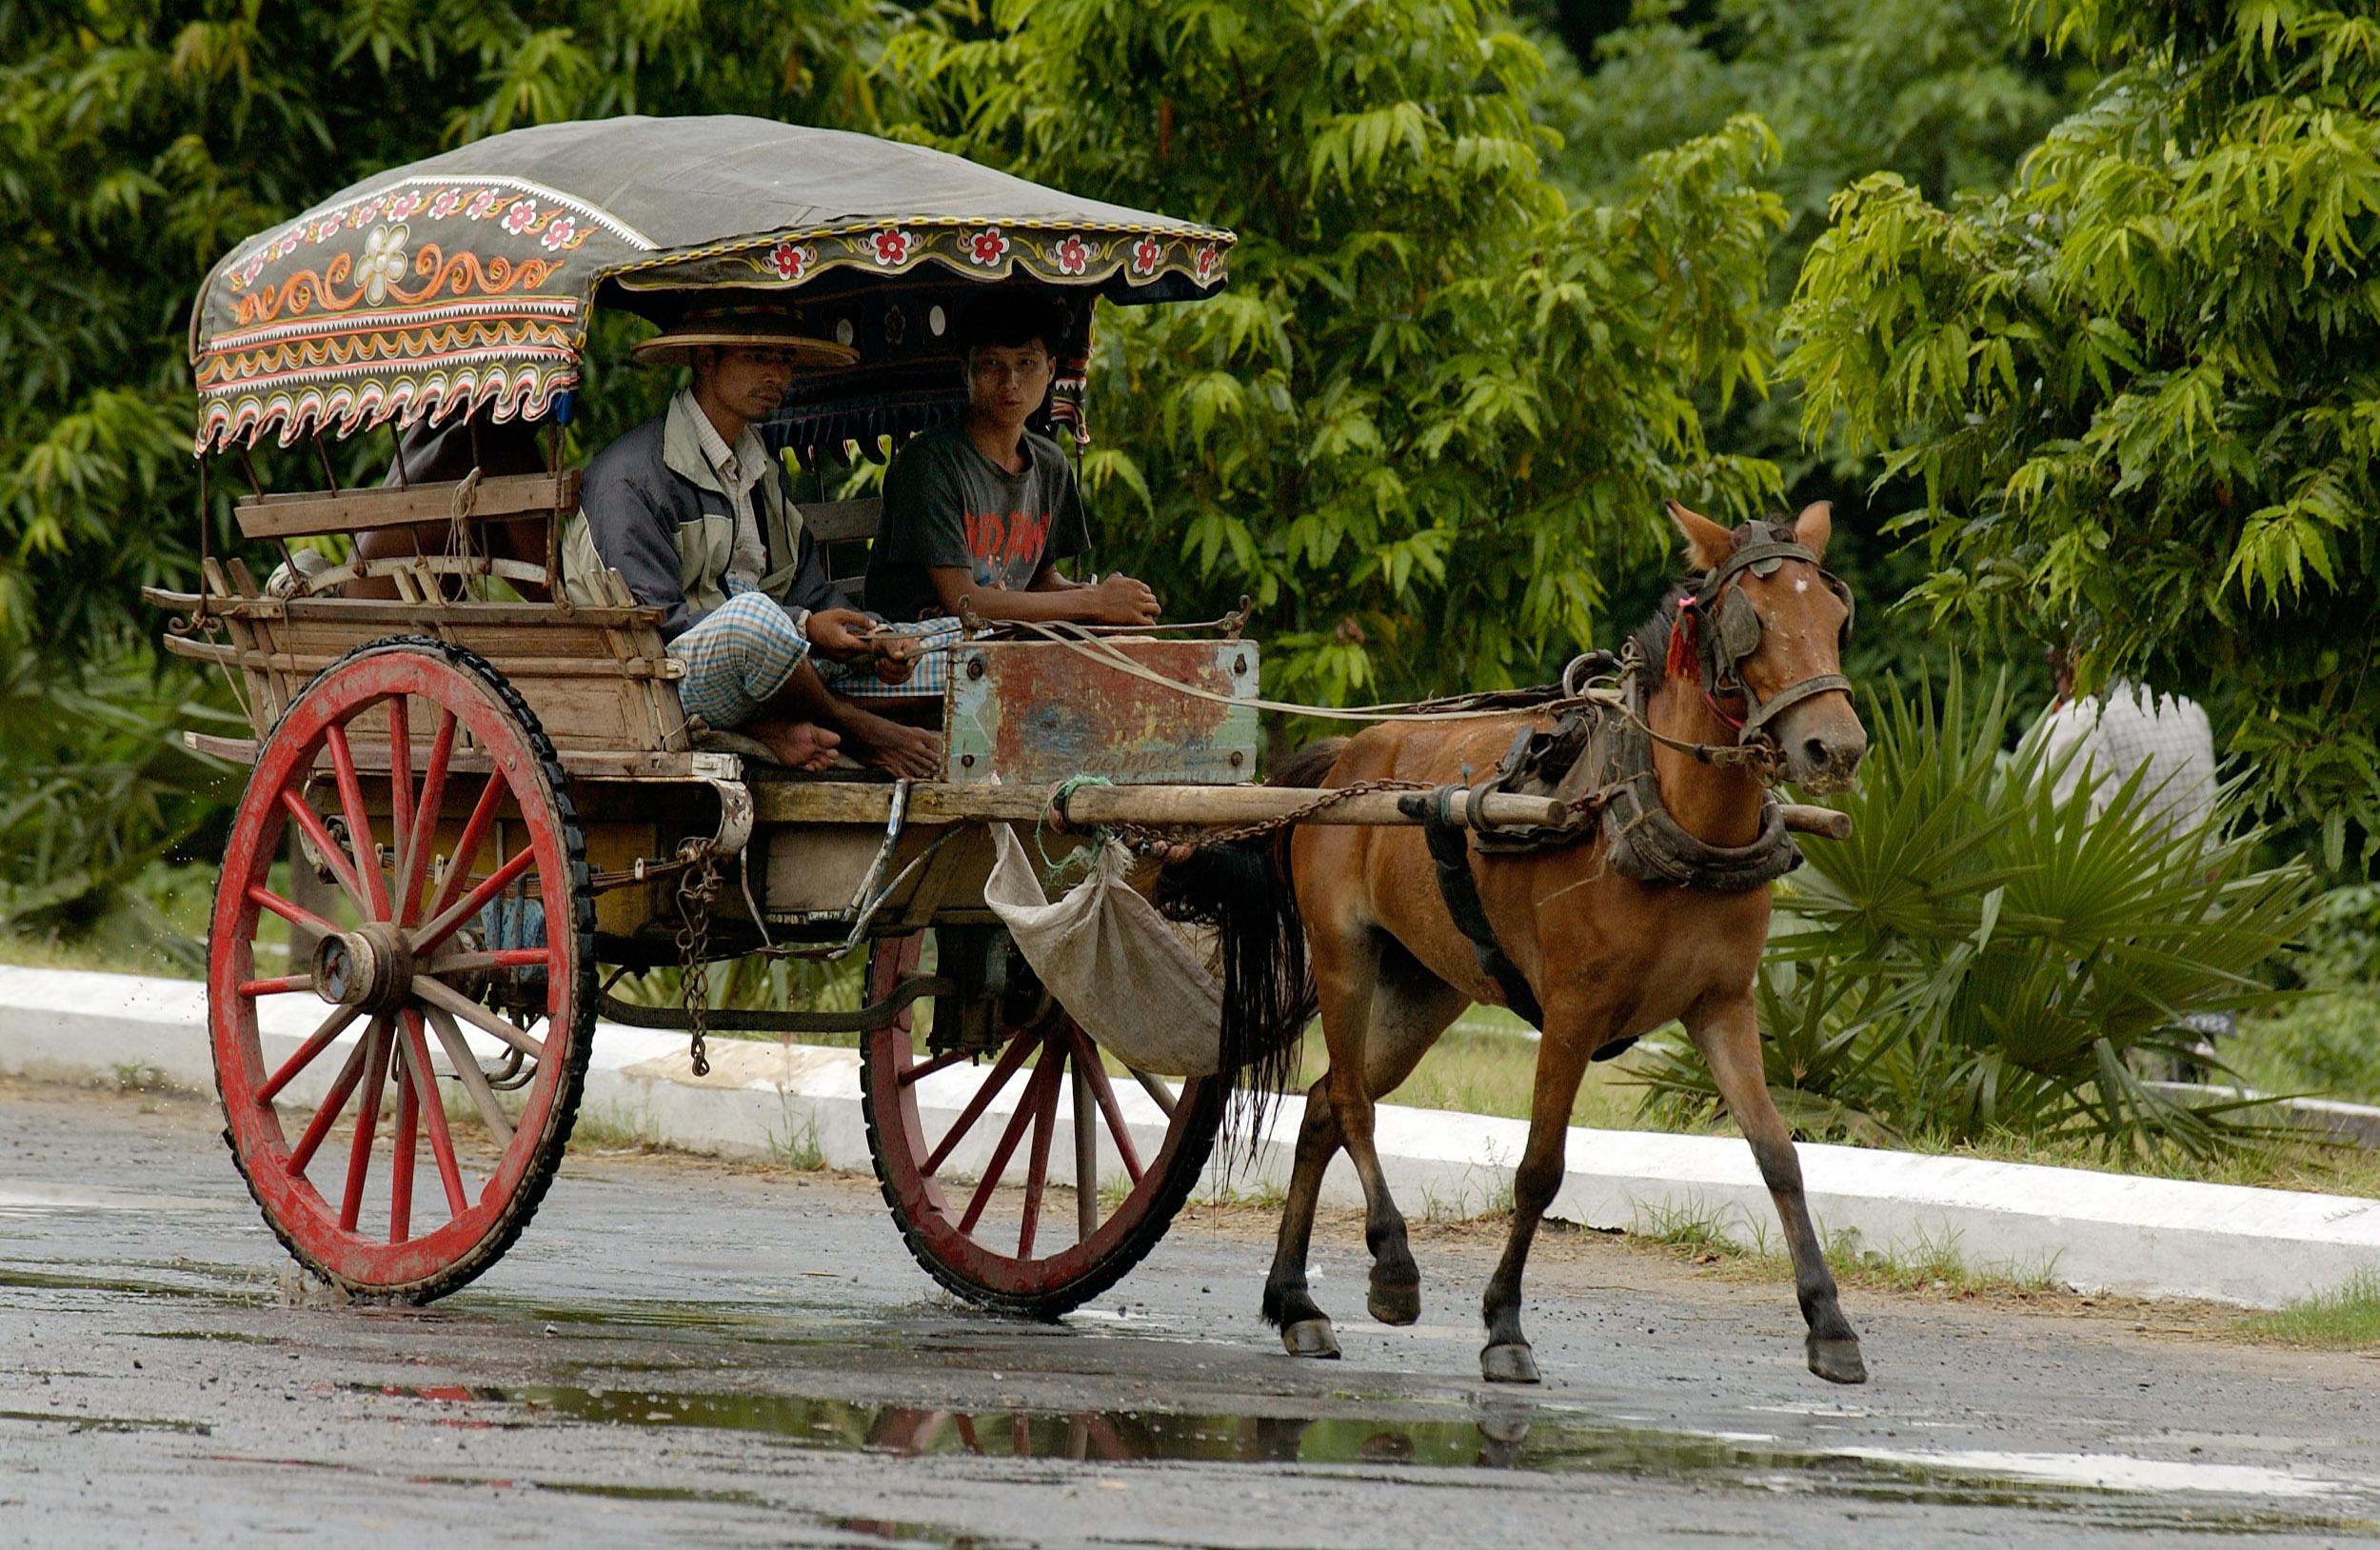 © Kevin Landwer-Johan. Horse and cart